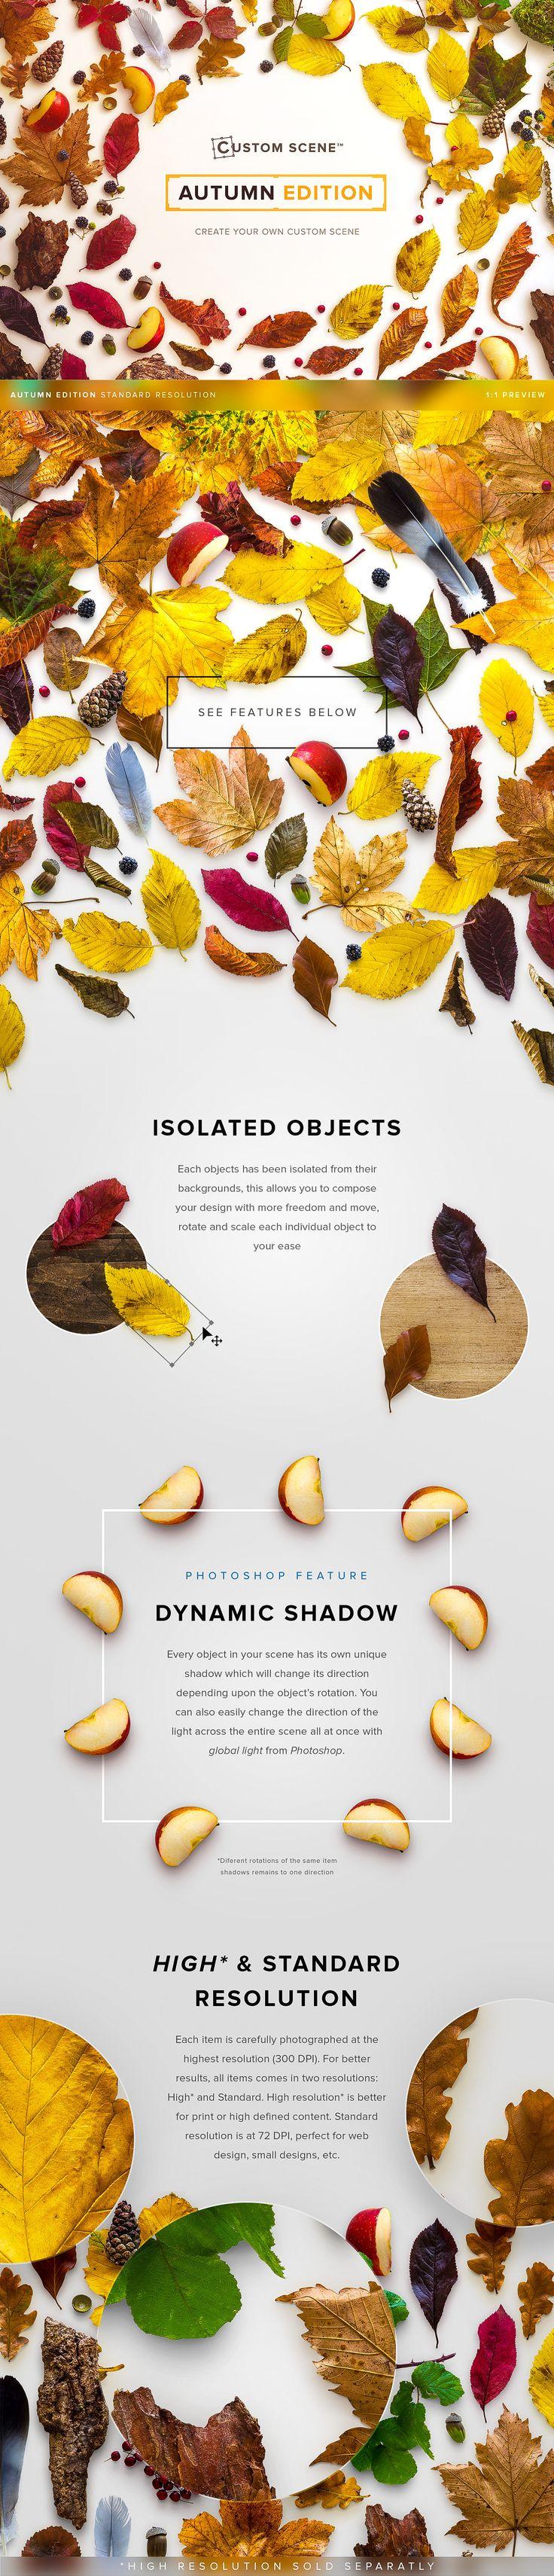 -50% Autumn Edition - Custom Scene by Román Jusdado on @creativemarket